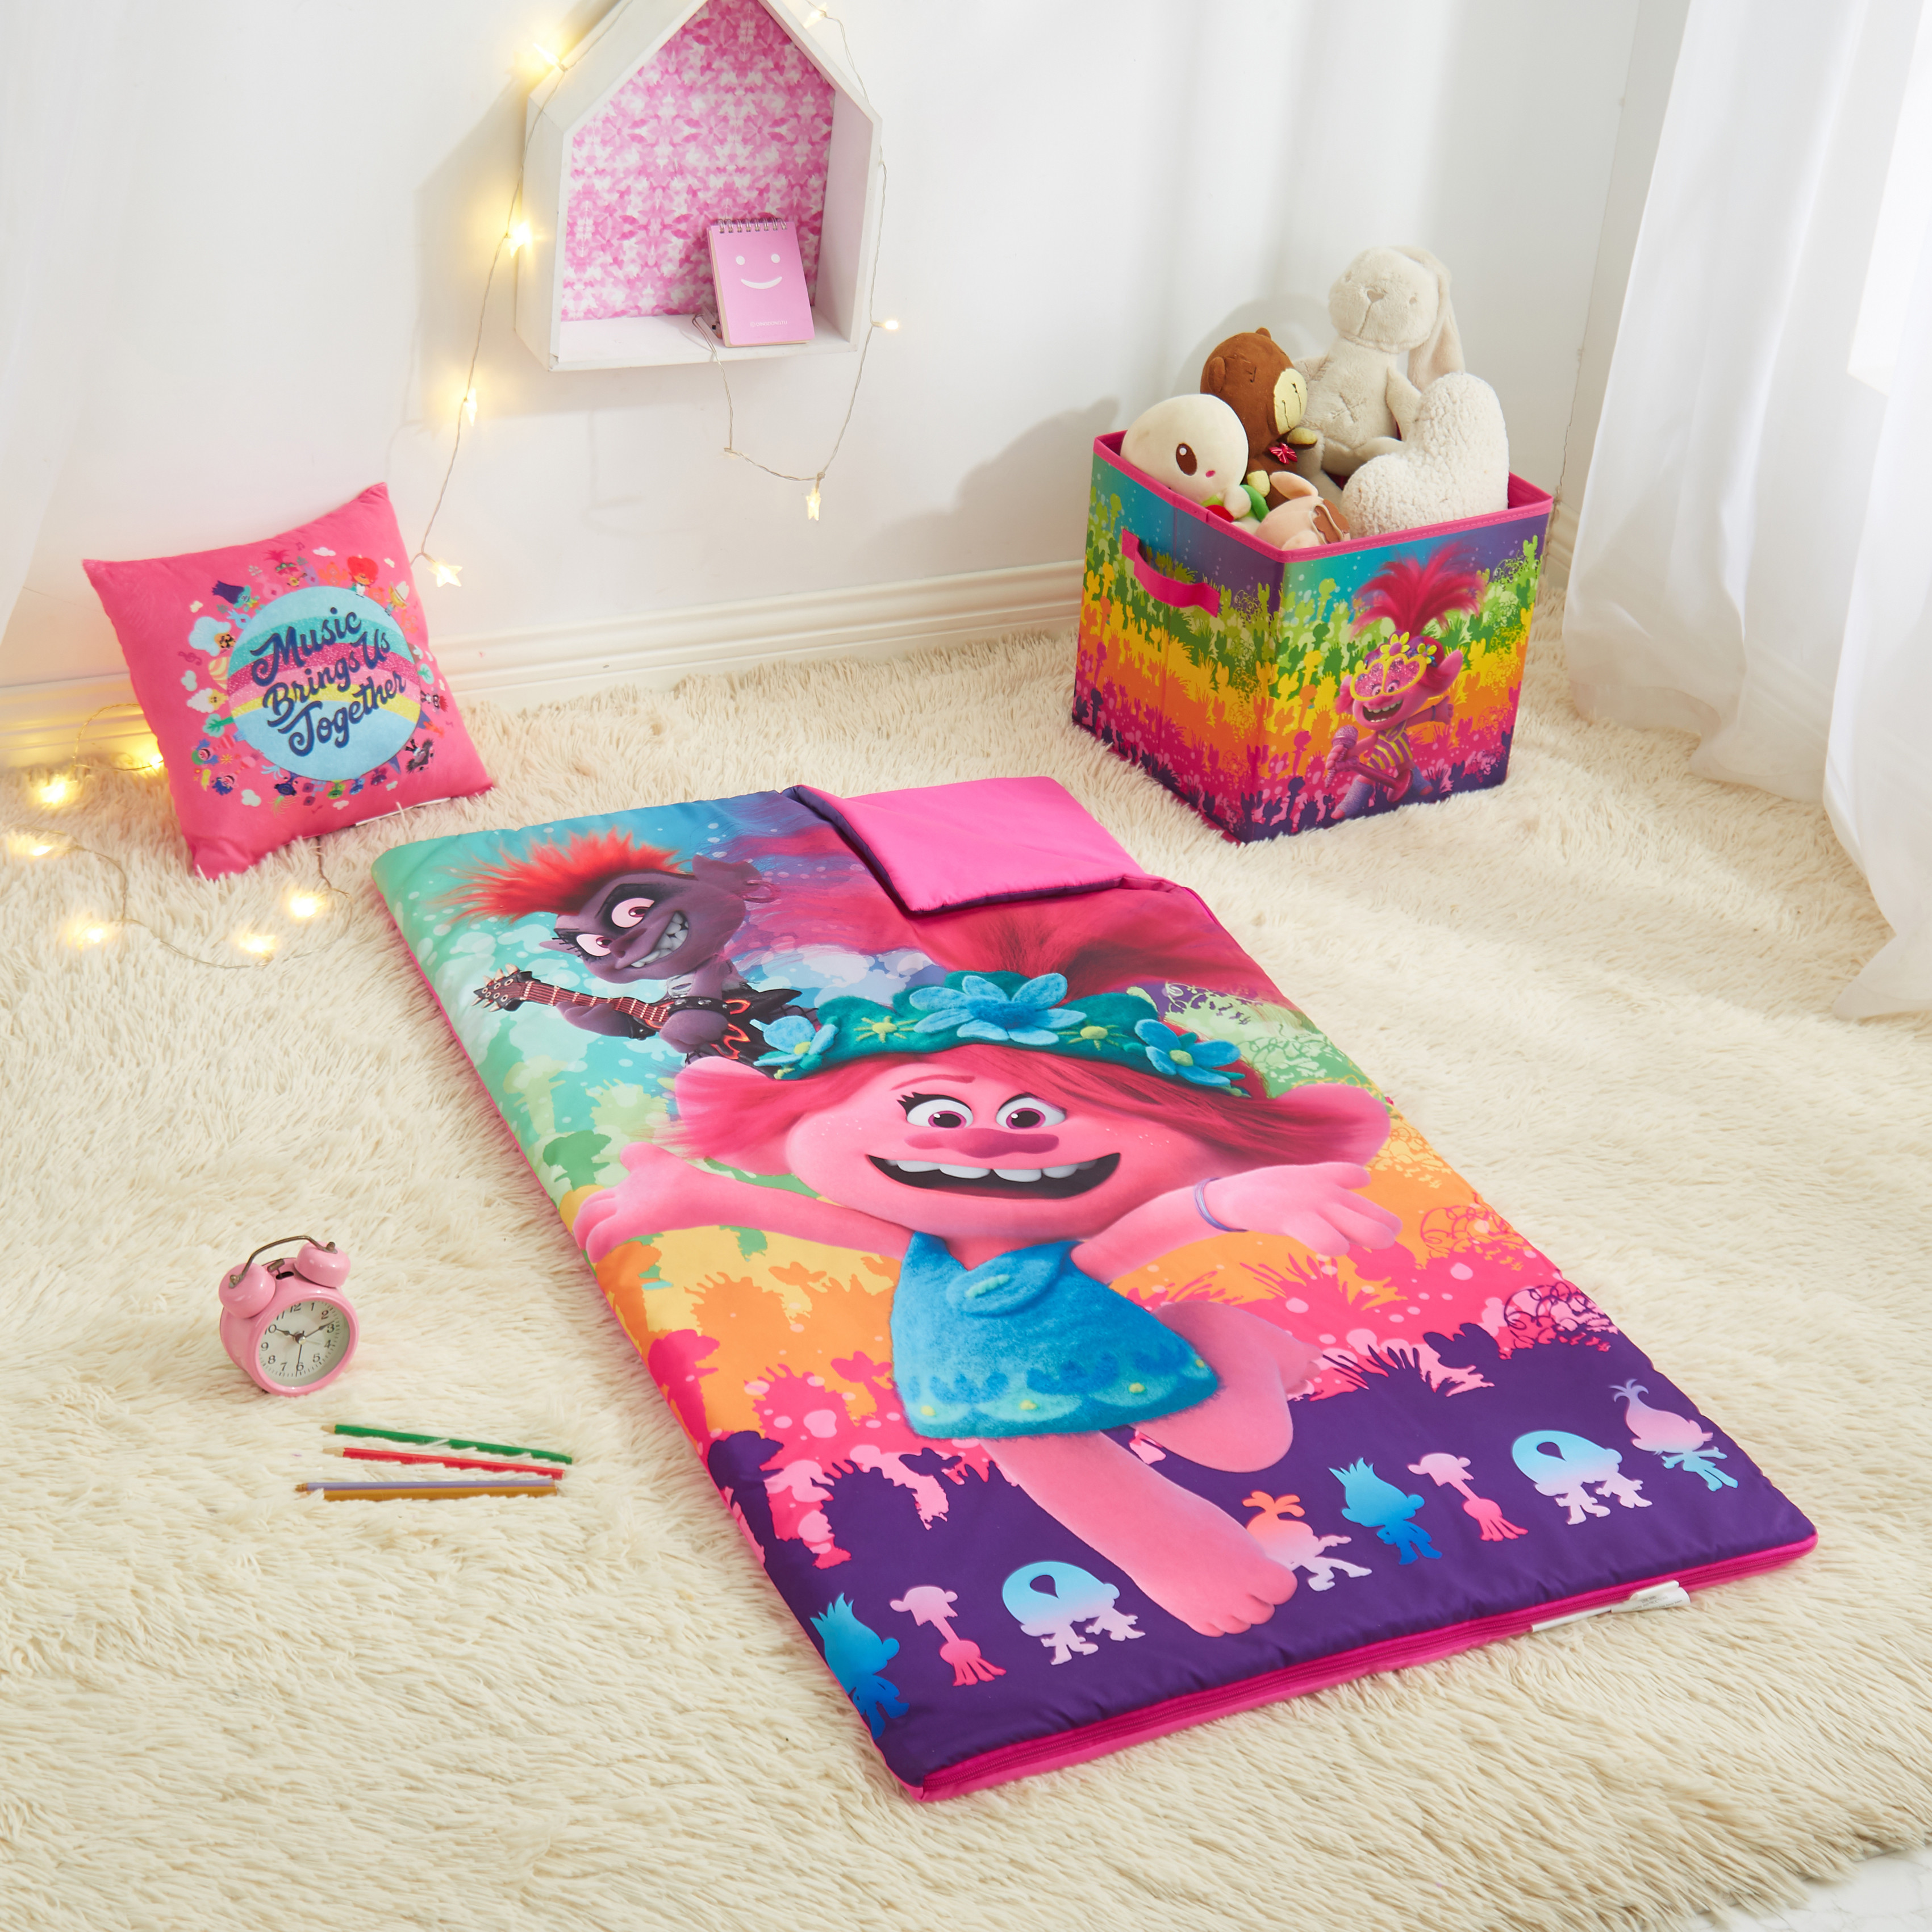 trolls 2 combo set with sleeping bag storage cube and bonus pillow walmart com